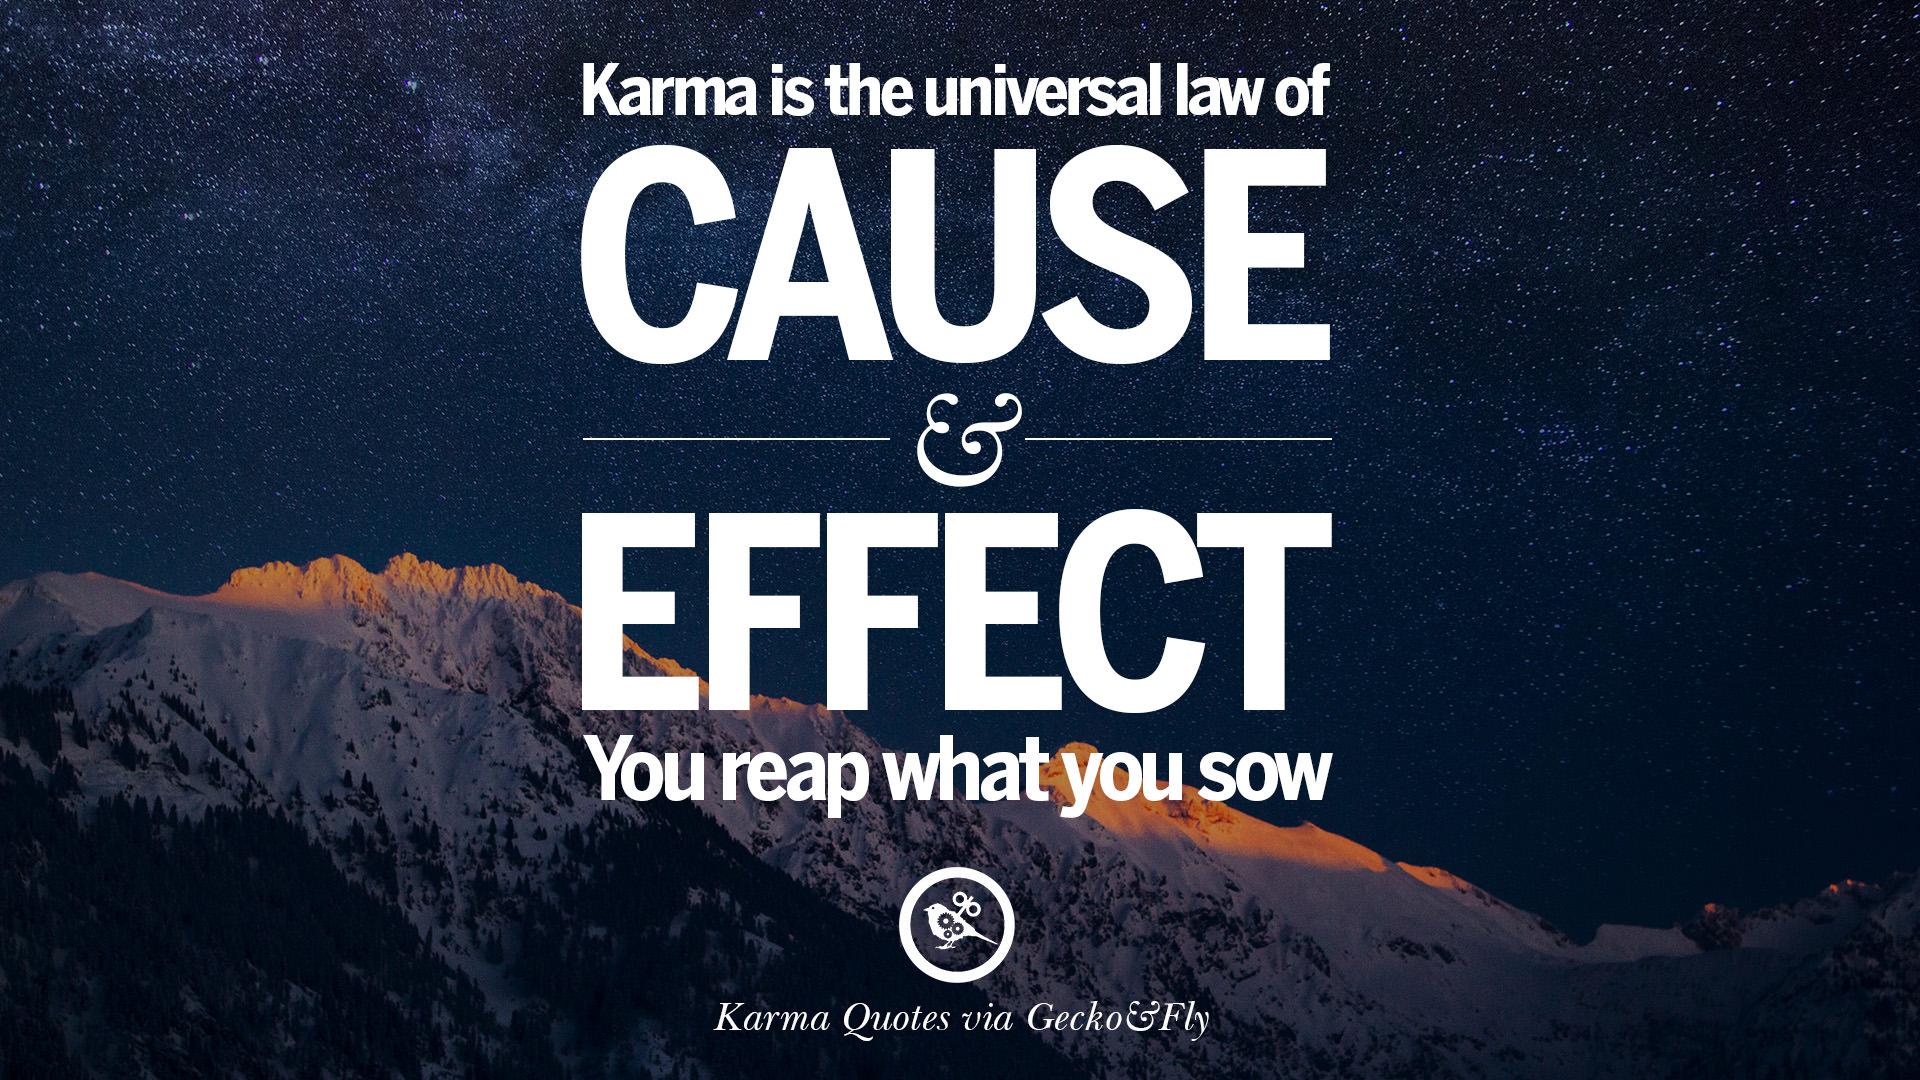 Funny Karma Quotes And Sayings